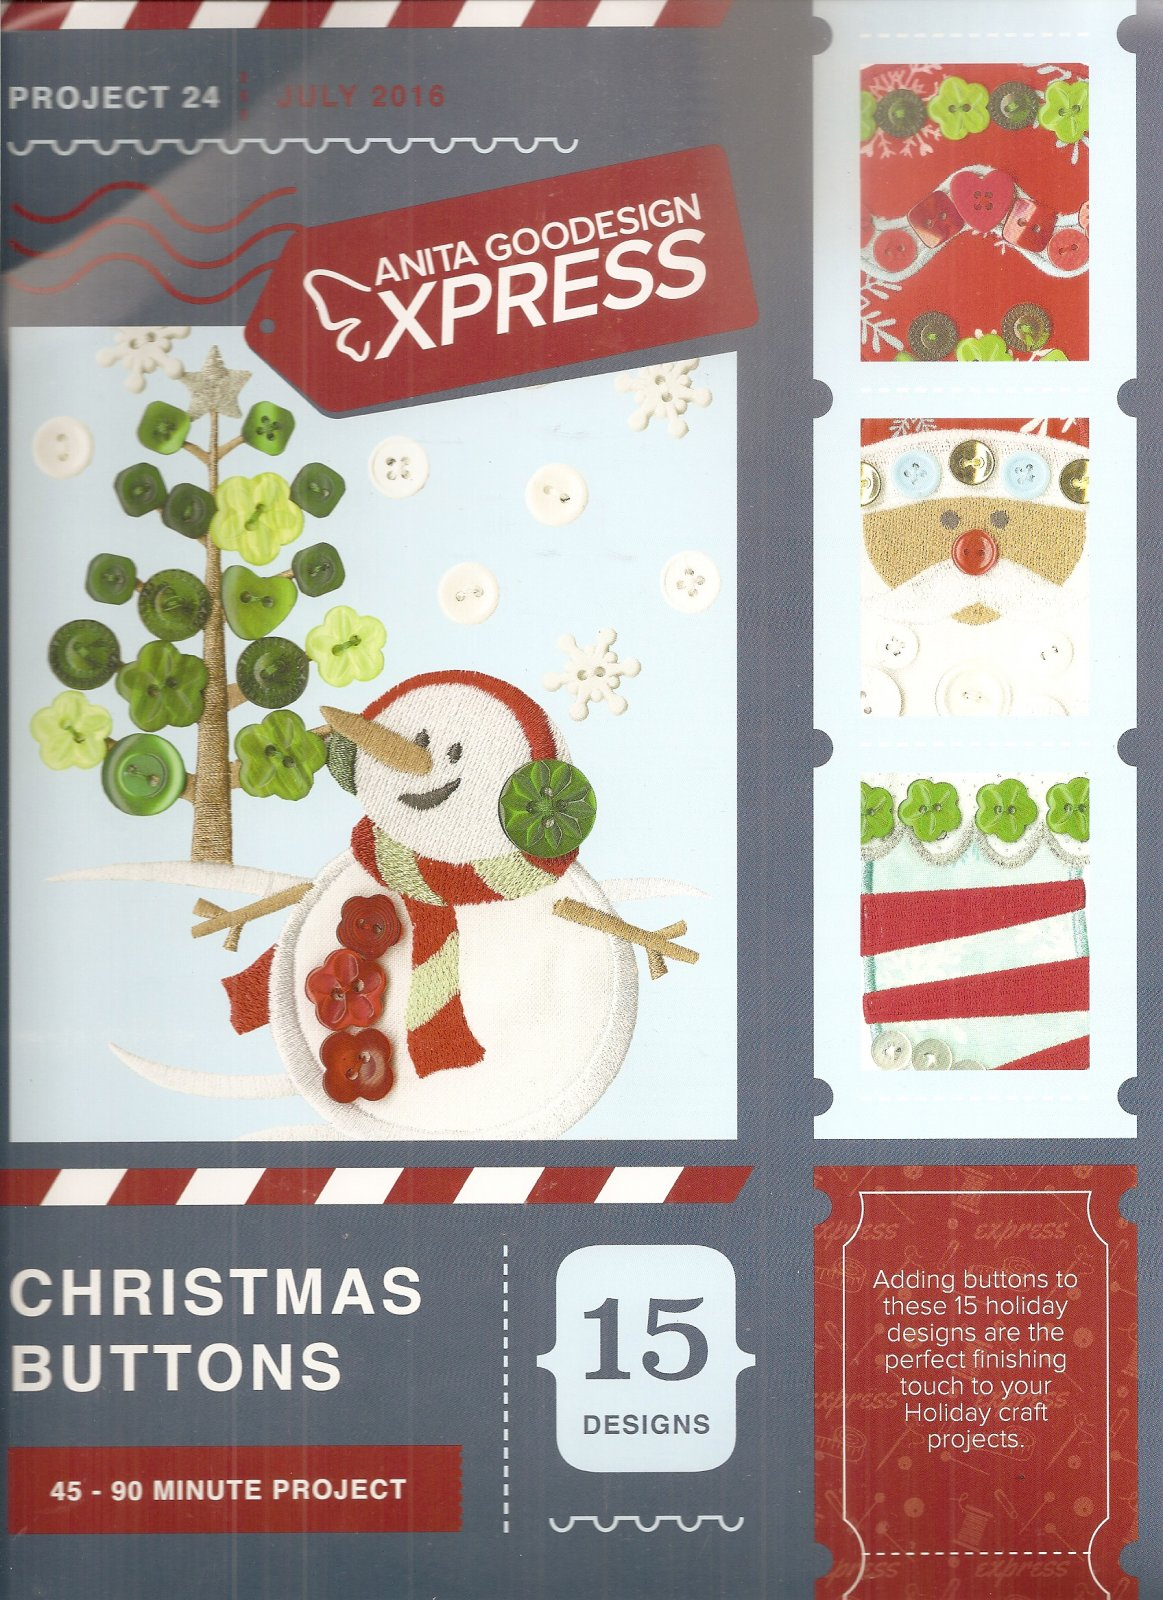 Anita Goodesign Express Christmas Buttons